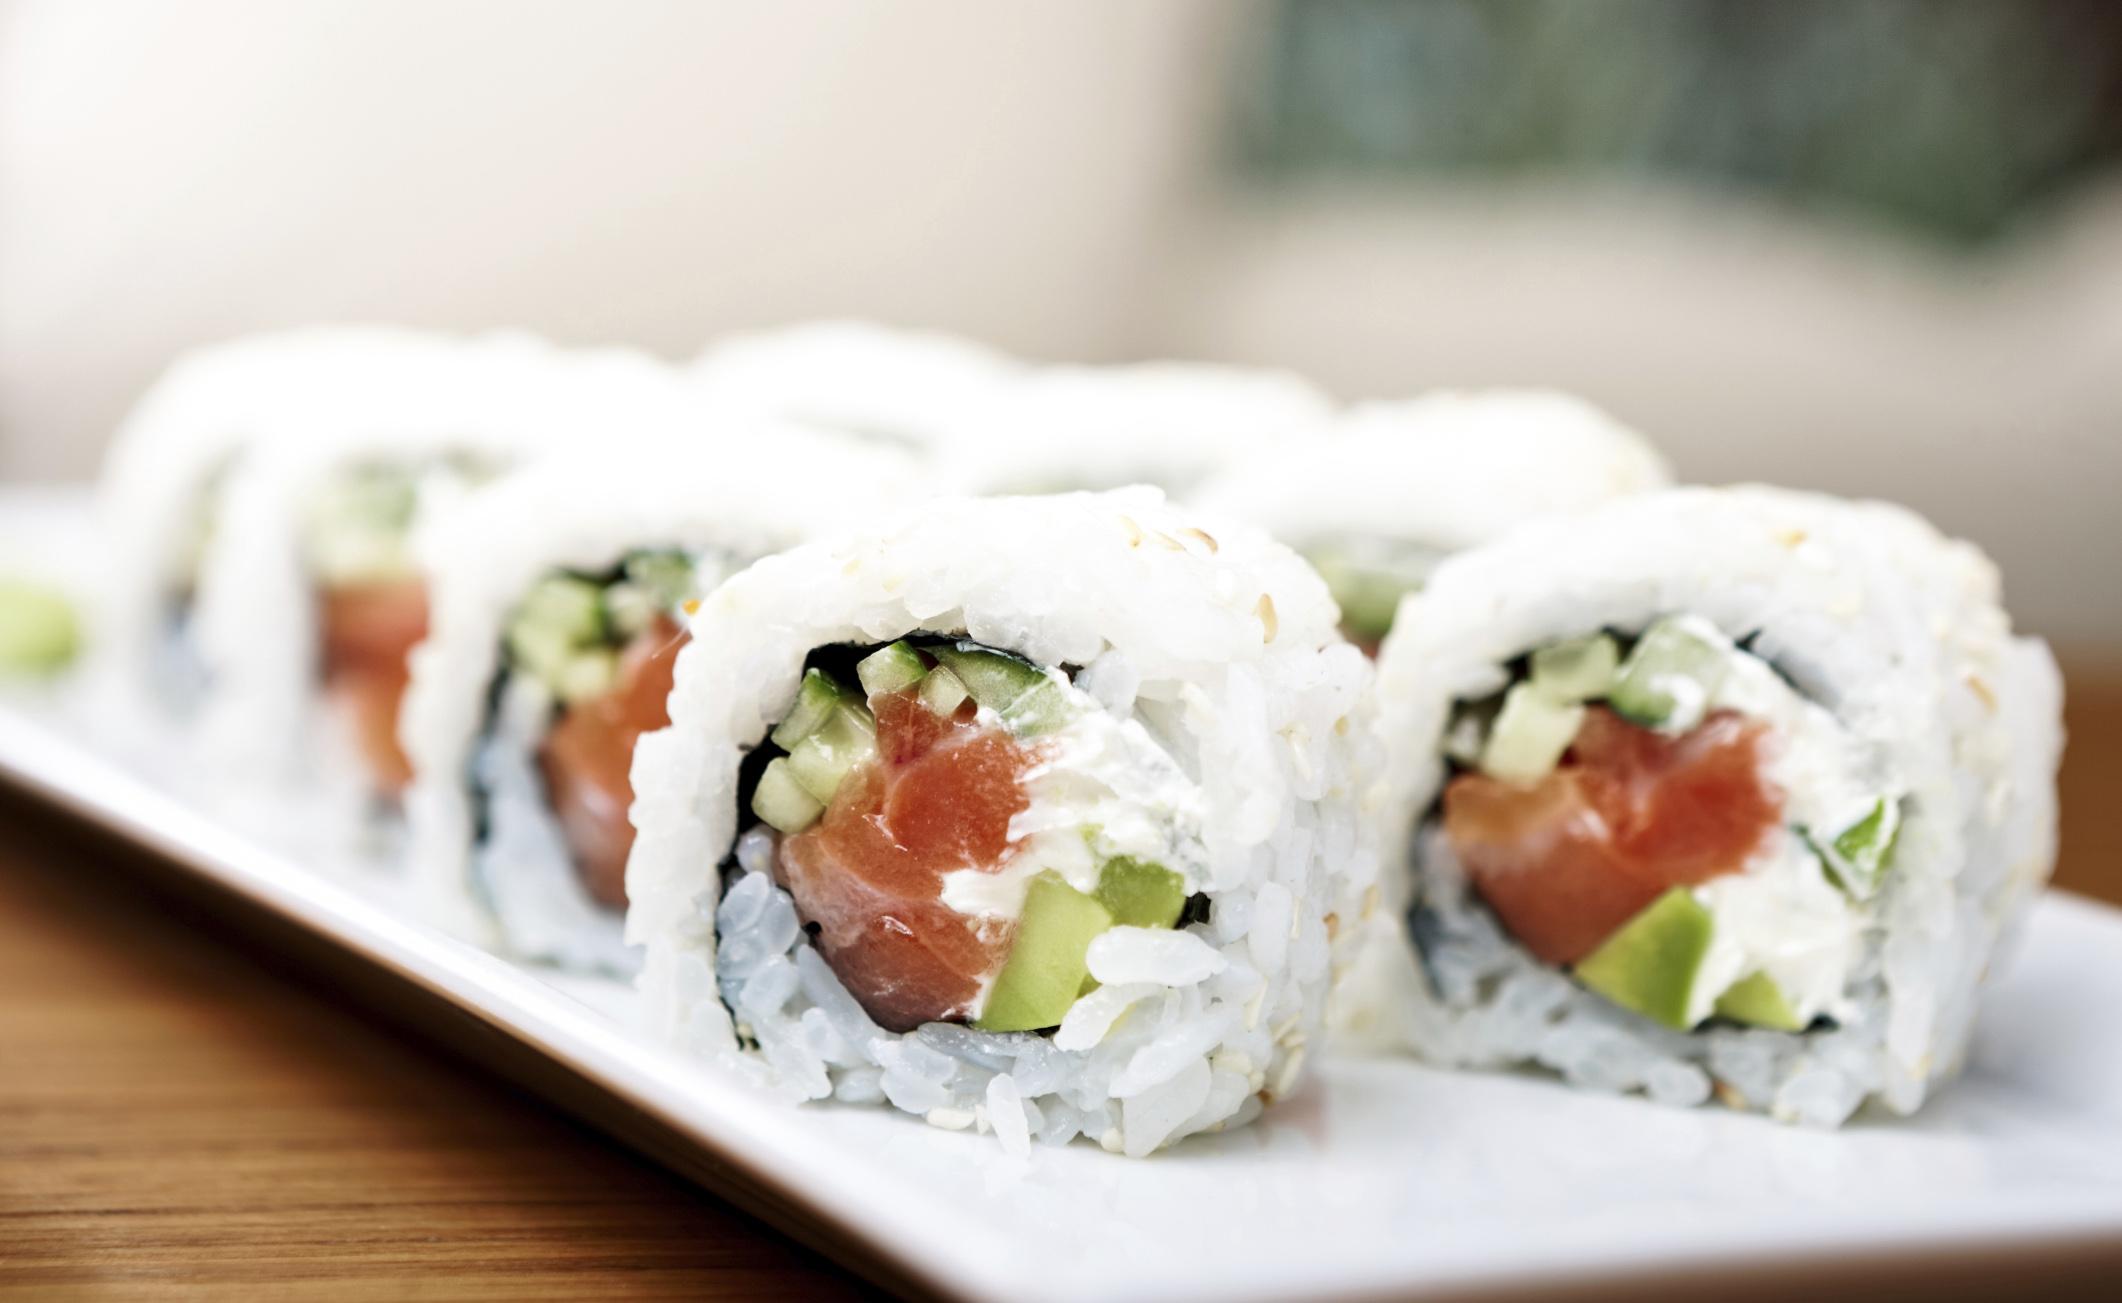 Sushi: i rischi del pesce crudo